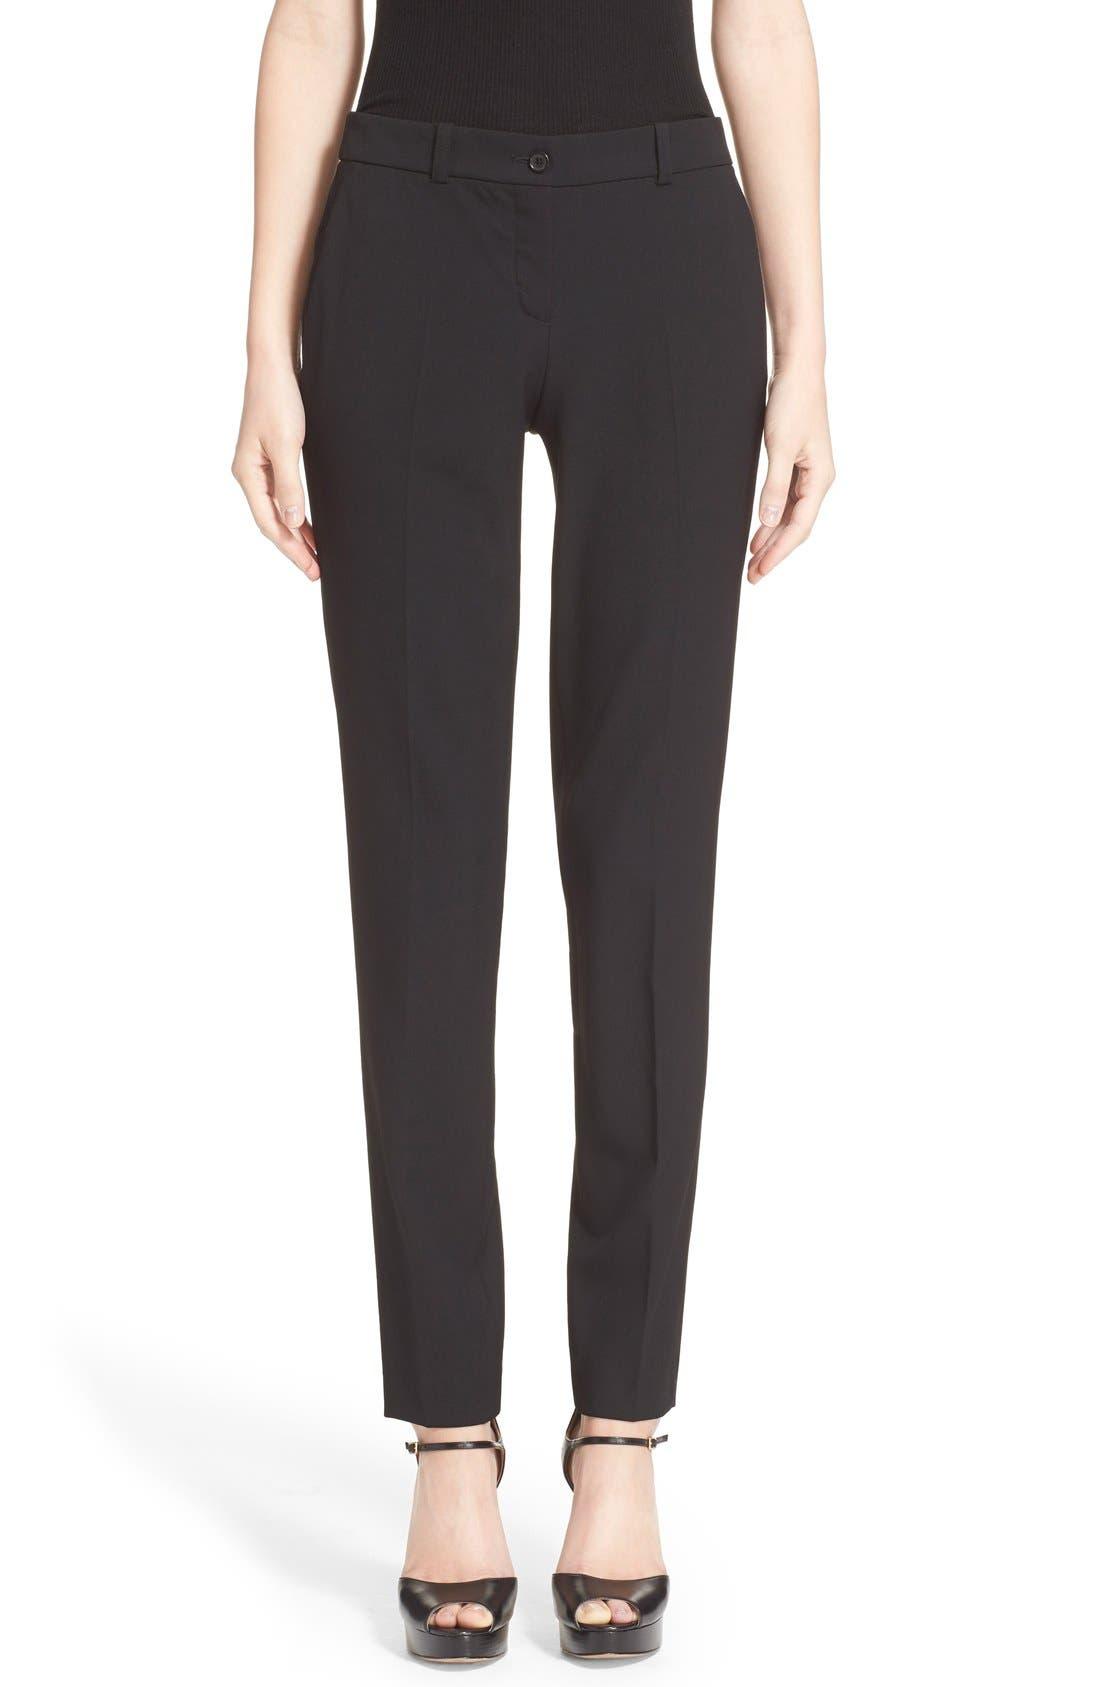 Main Image - Michael Kors 'Samantha' Stretch Wool Straight Leg Pants